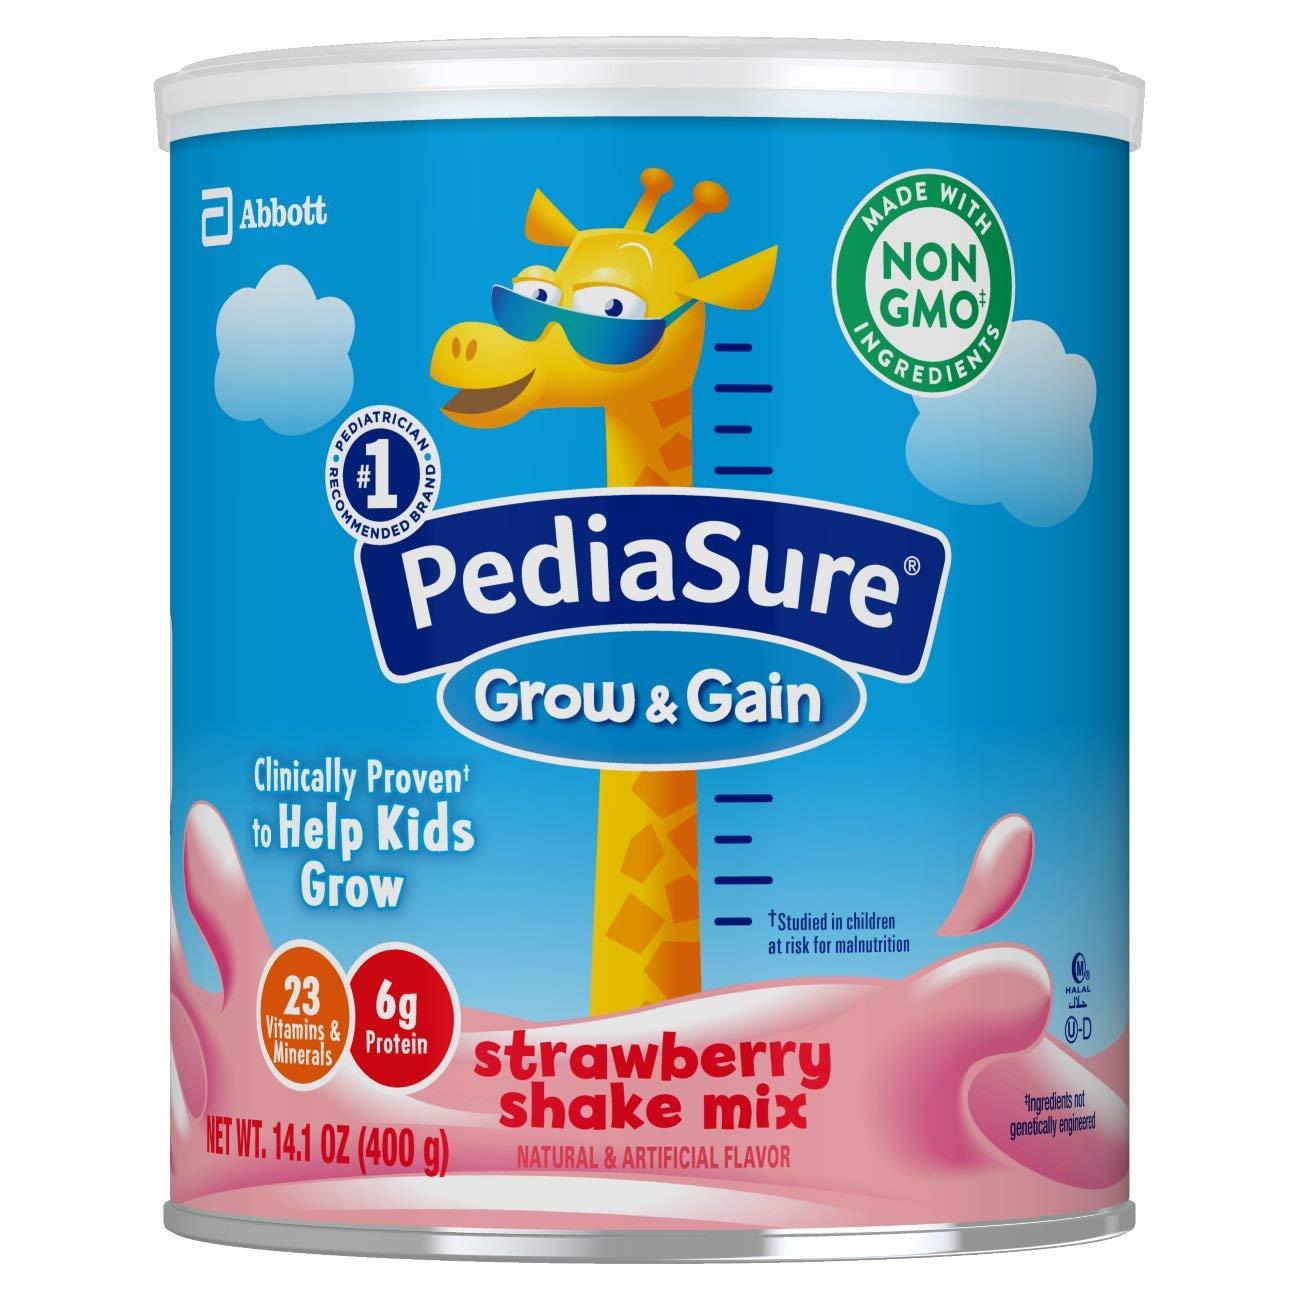 PediaSure Grow & Gain Non-GMO & Gluten-Free Shake Mix Powder, Nutritional Shake For Kids, With Protein, Probiotics, DHA, Antioxidants*, and Vitamins & Minerals, Strawberry, 14.1 oz, 3 Count